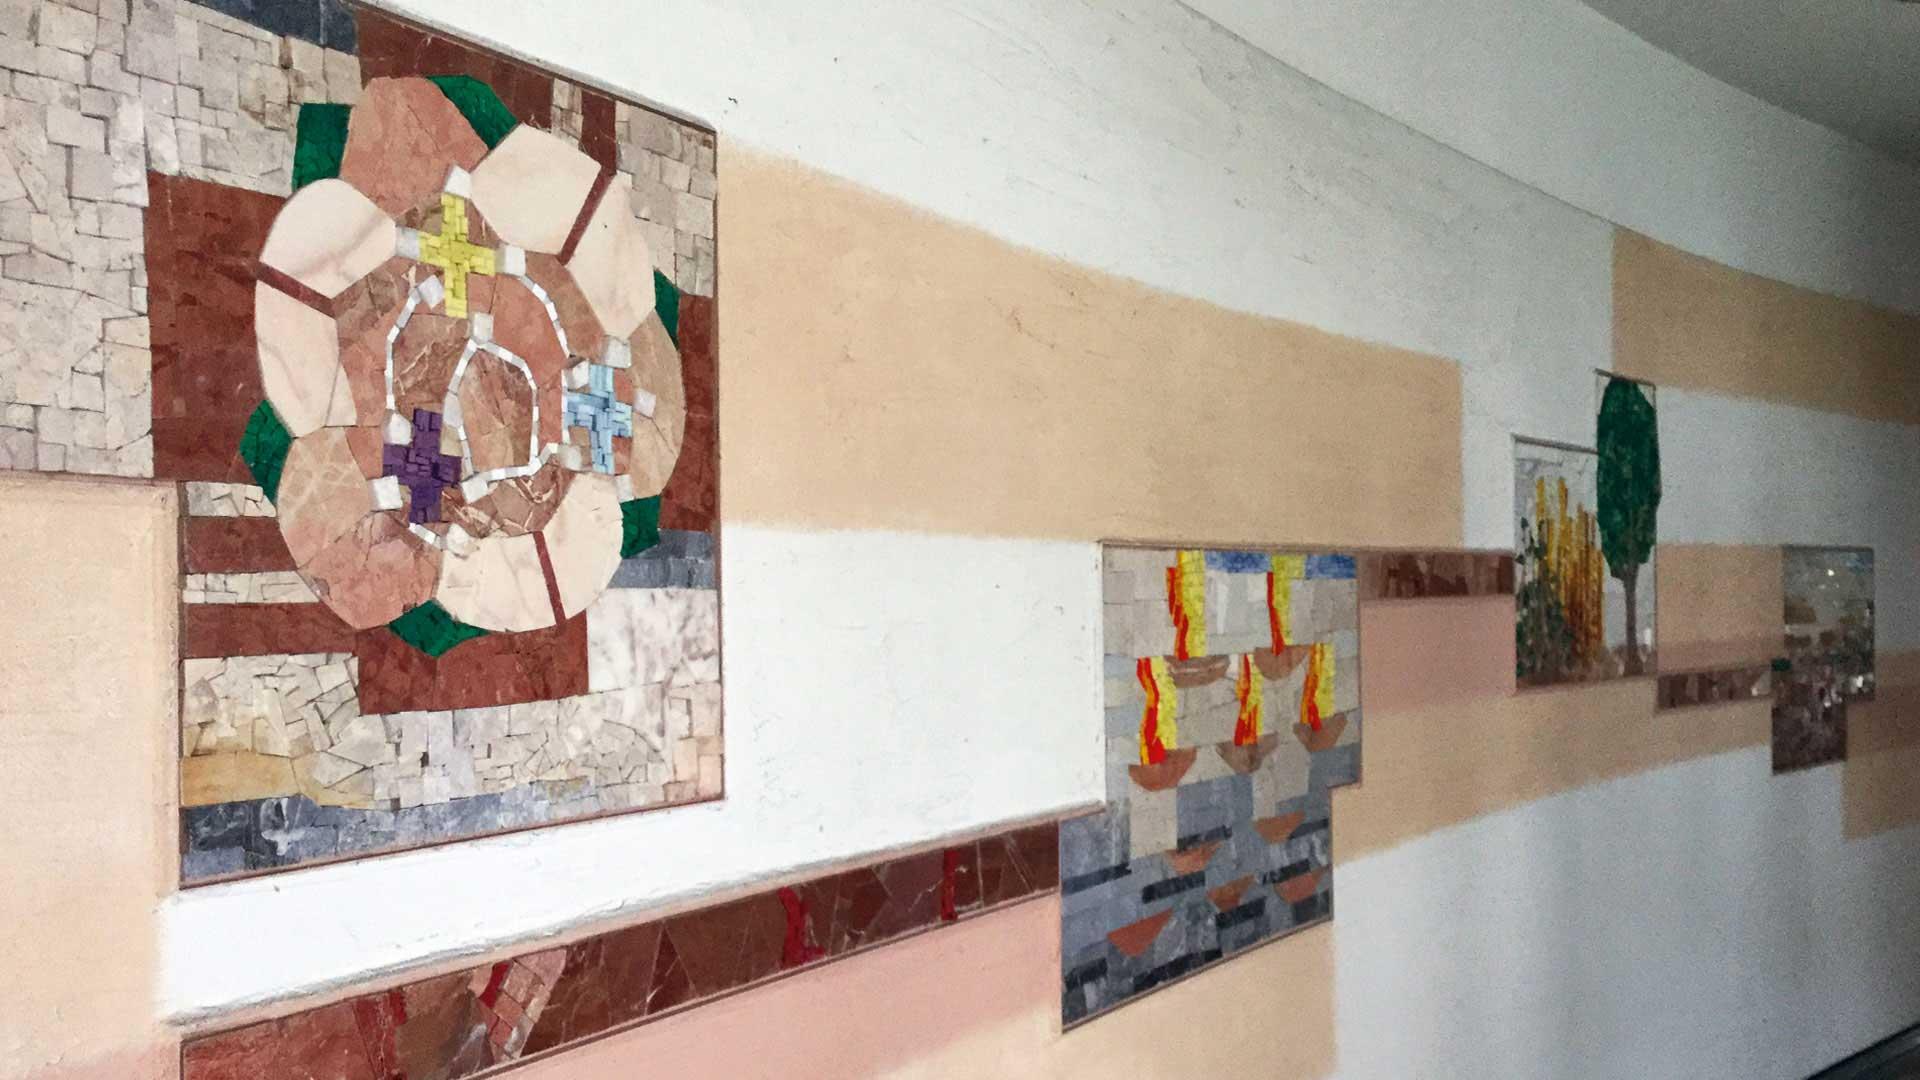 Seniorenzentrum-Bruder-Konrad-Stift-Wandmosaik-3